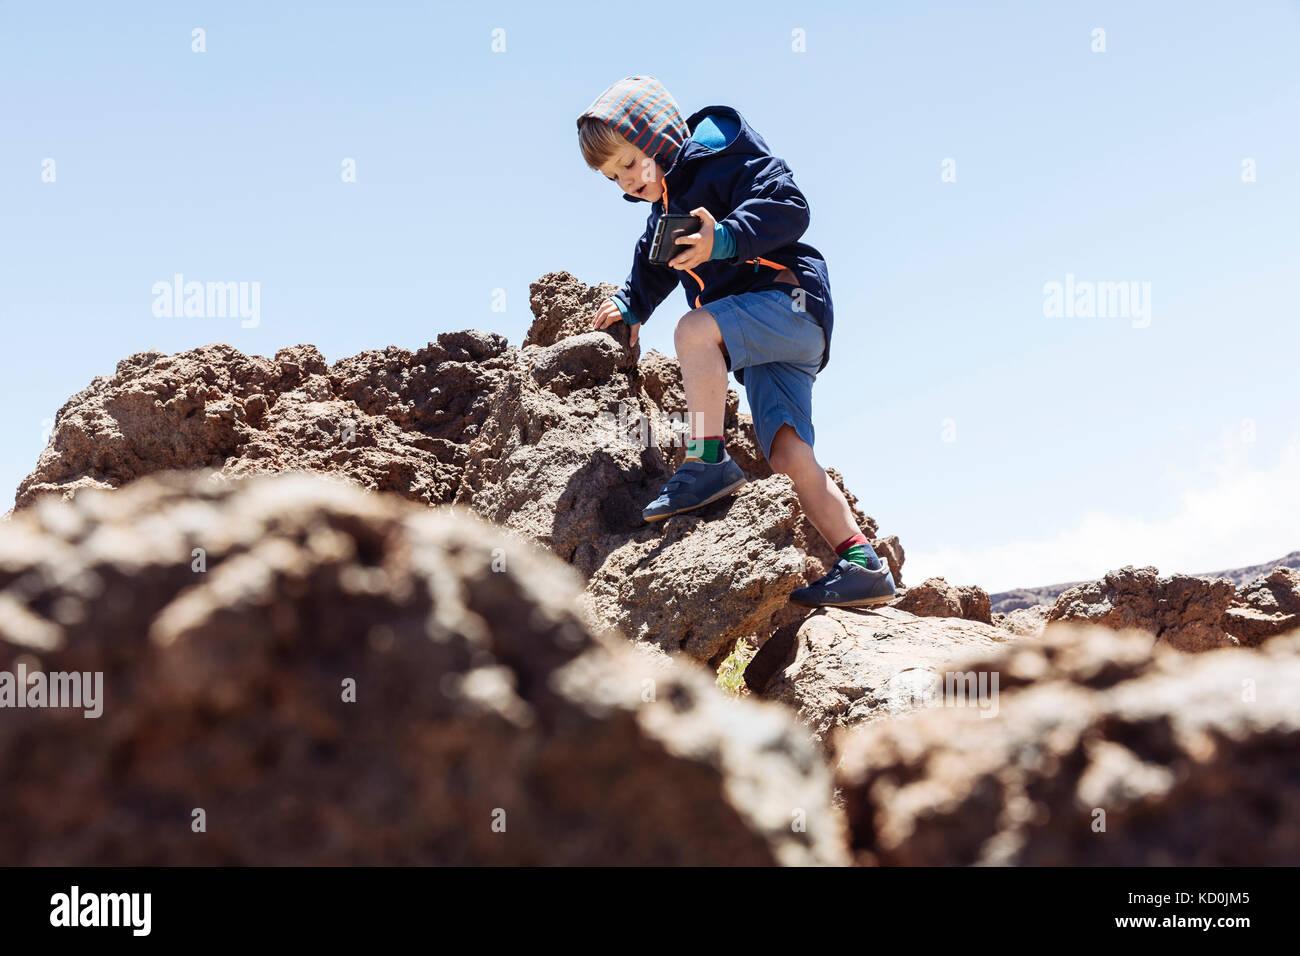 Boy clambering up rocks at Mount Teide, Tenerife, Canary Islands - Stock Image